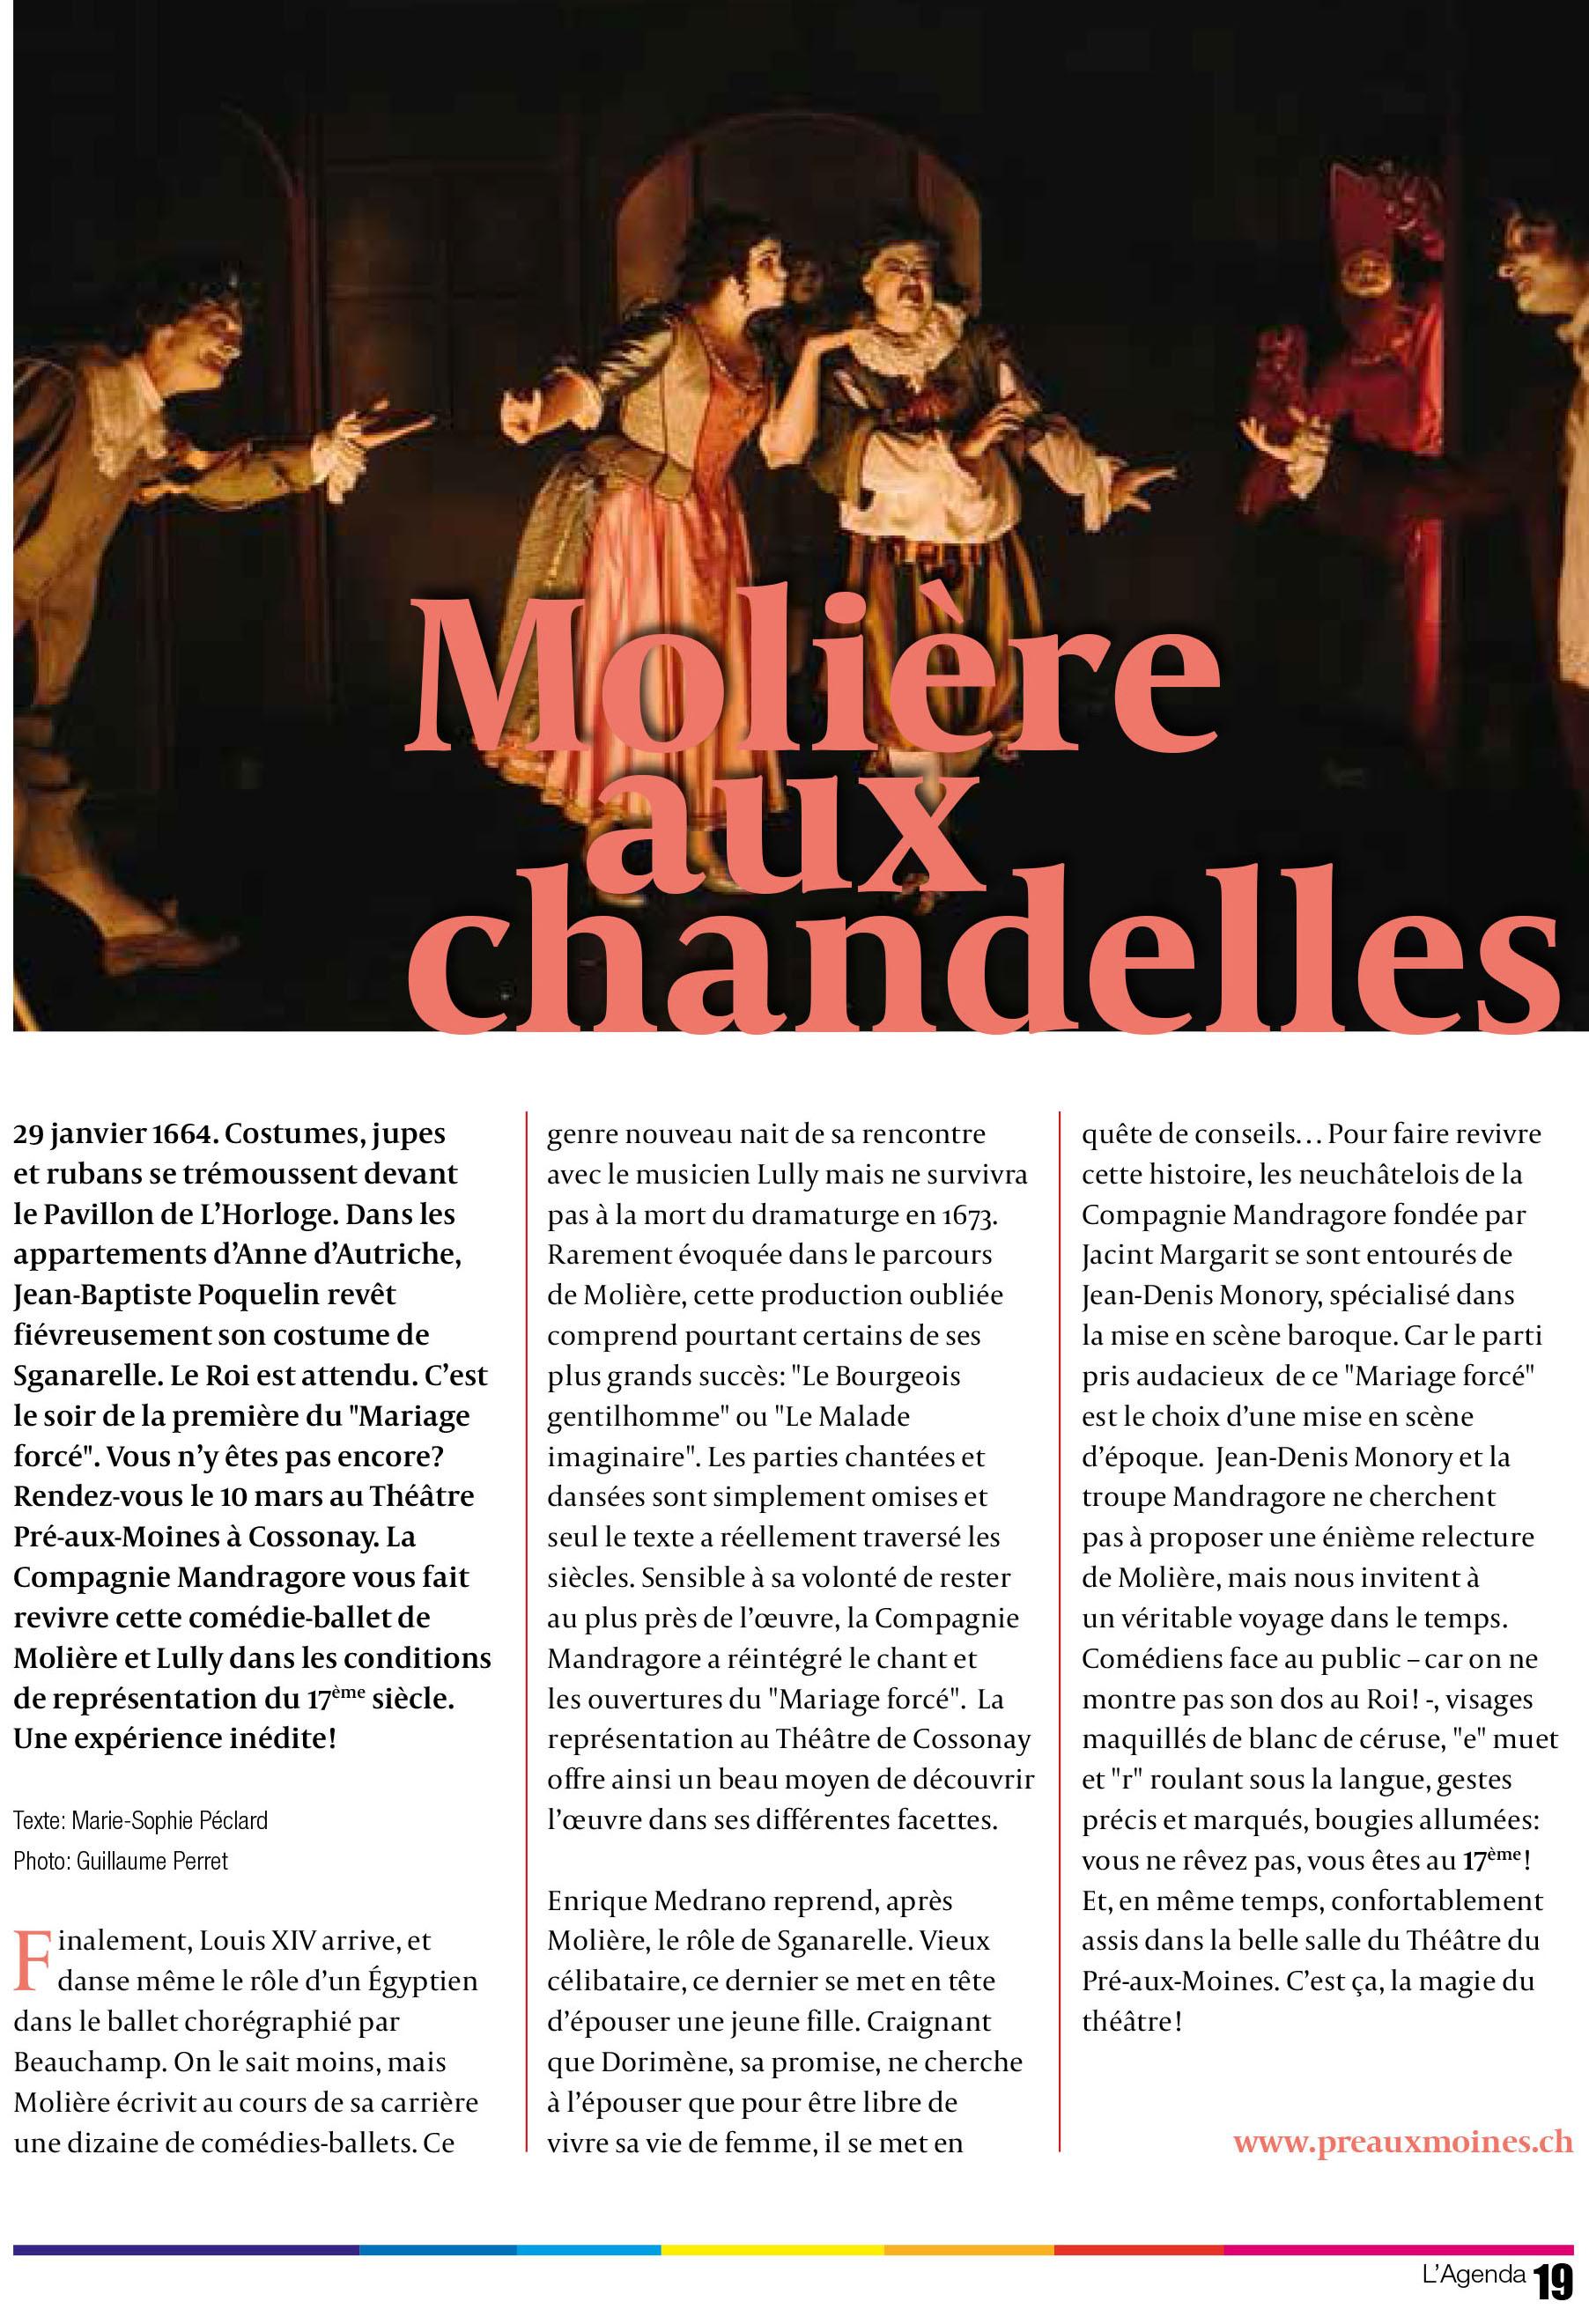 L'Agenda – La revue culturelle de l'Arc lémanique, No 67, 01.03.2017